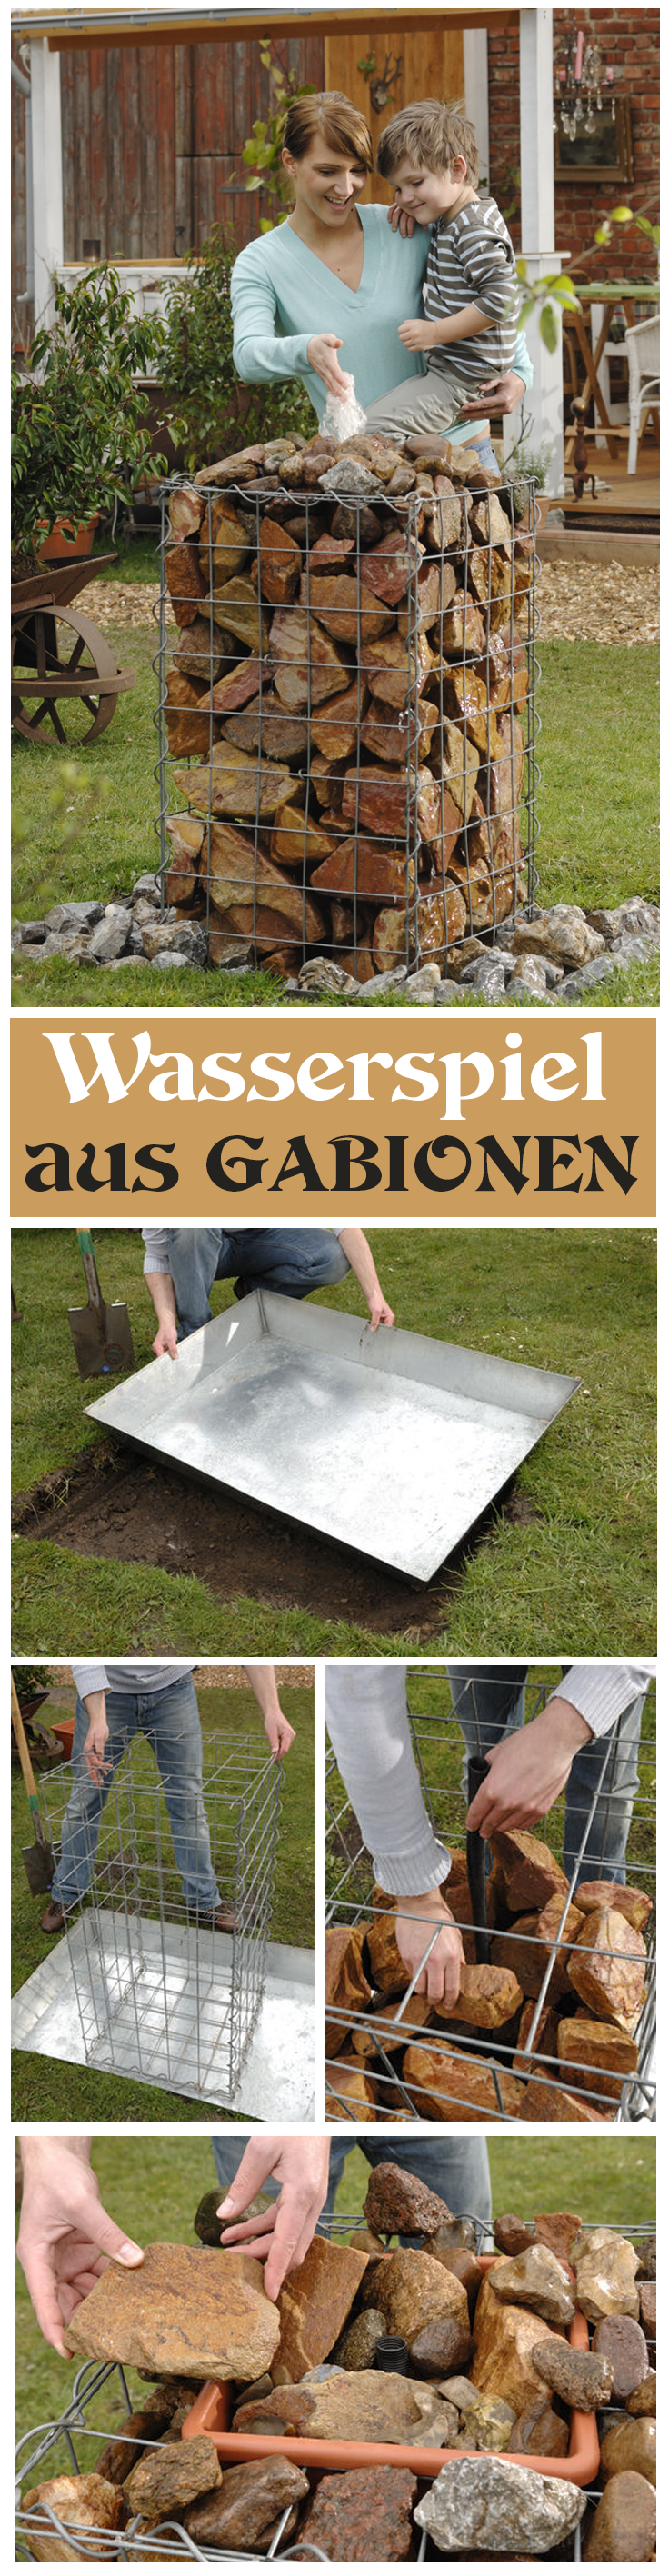 Wasserspiel: Gabionen Brunnen | Selbst.de